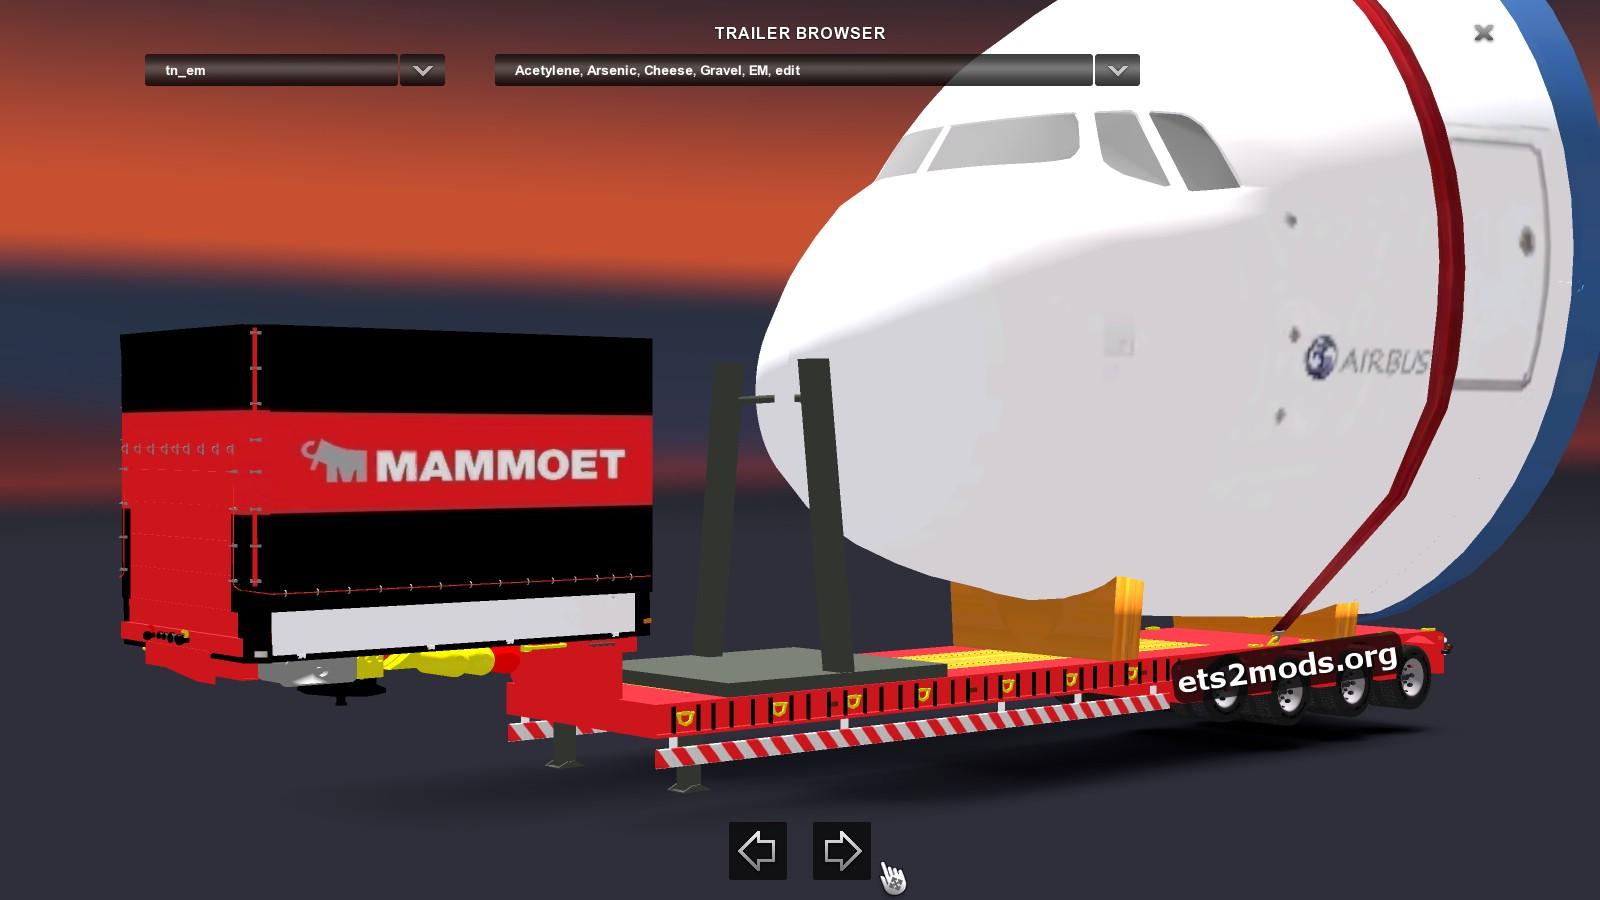 Trailer Cargo Plane Head